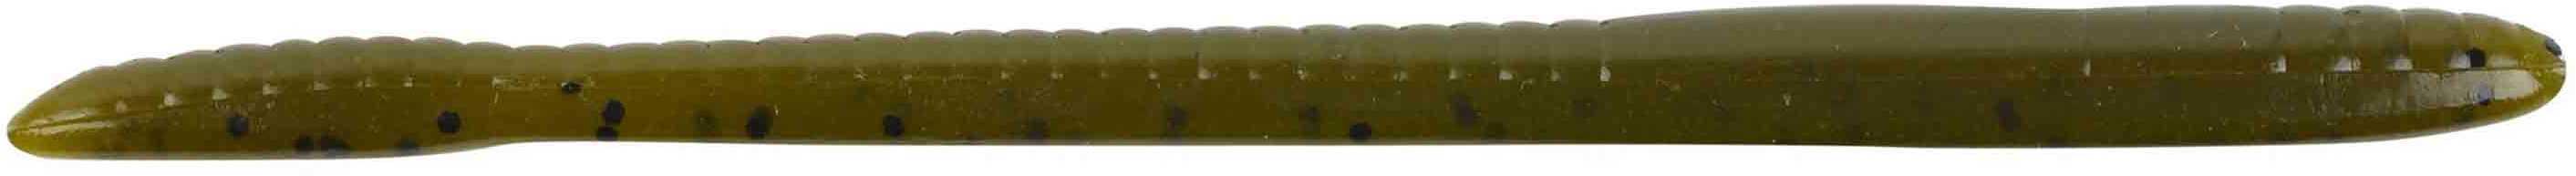 Berkley Havoc Bottom Hopper 6-1/4in 12per bag Green Pumpkin Md#: HVMBH6-GP